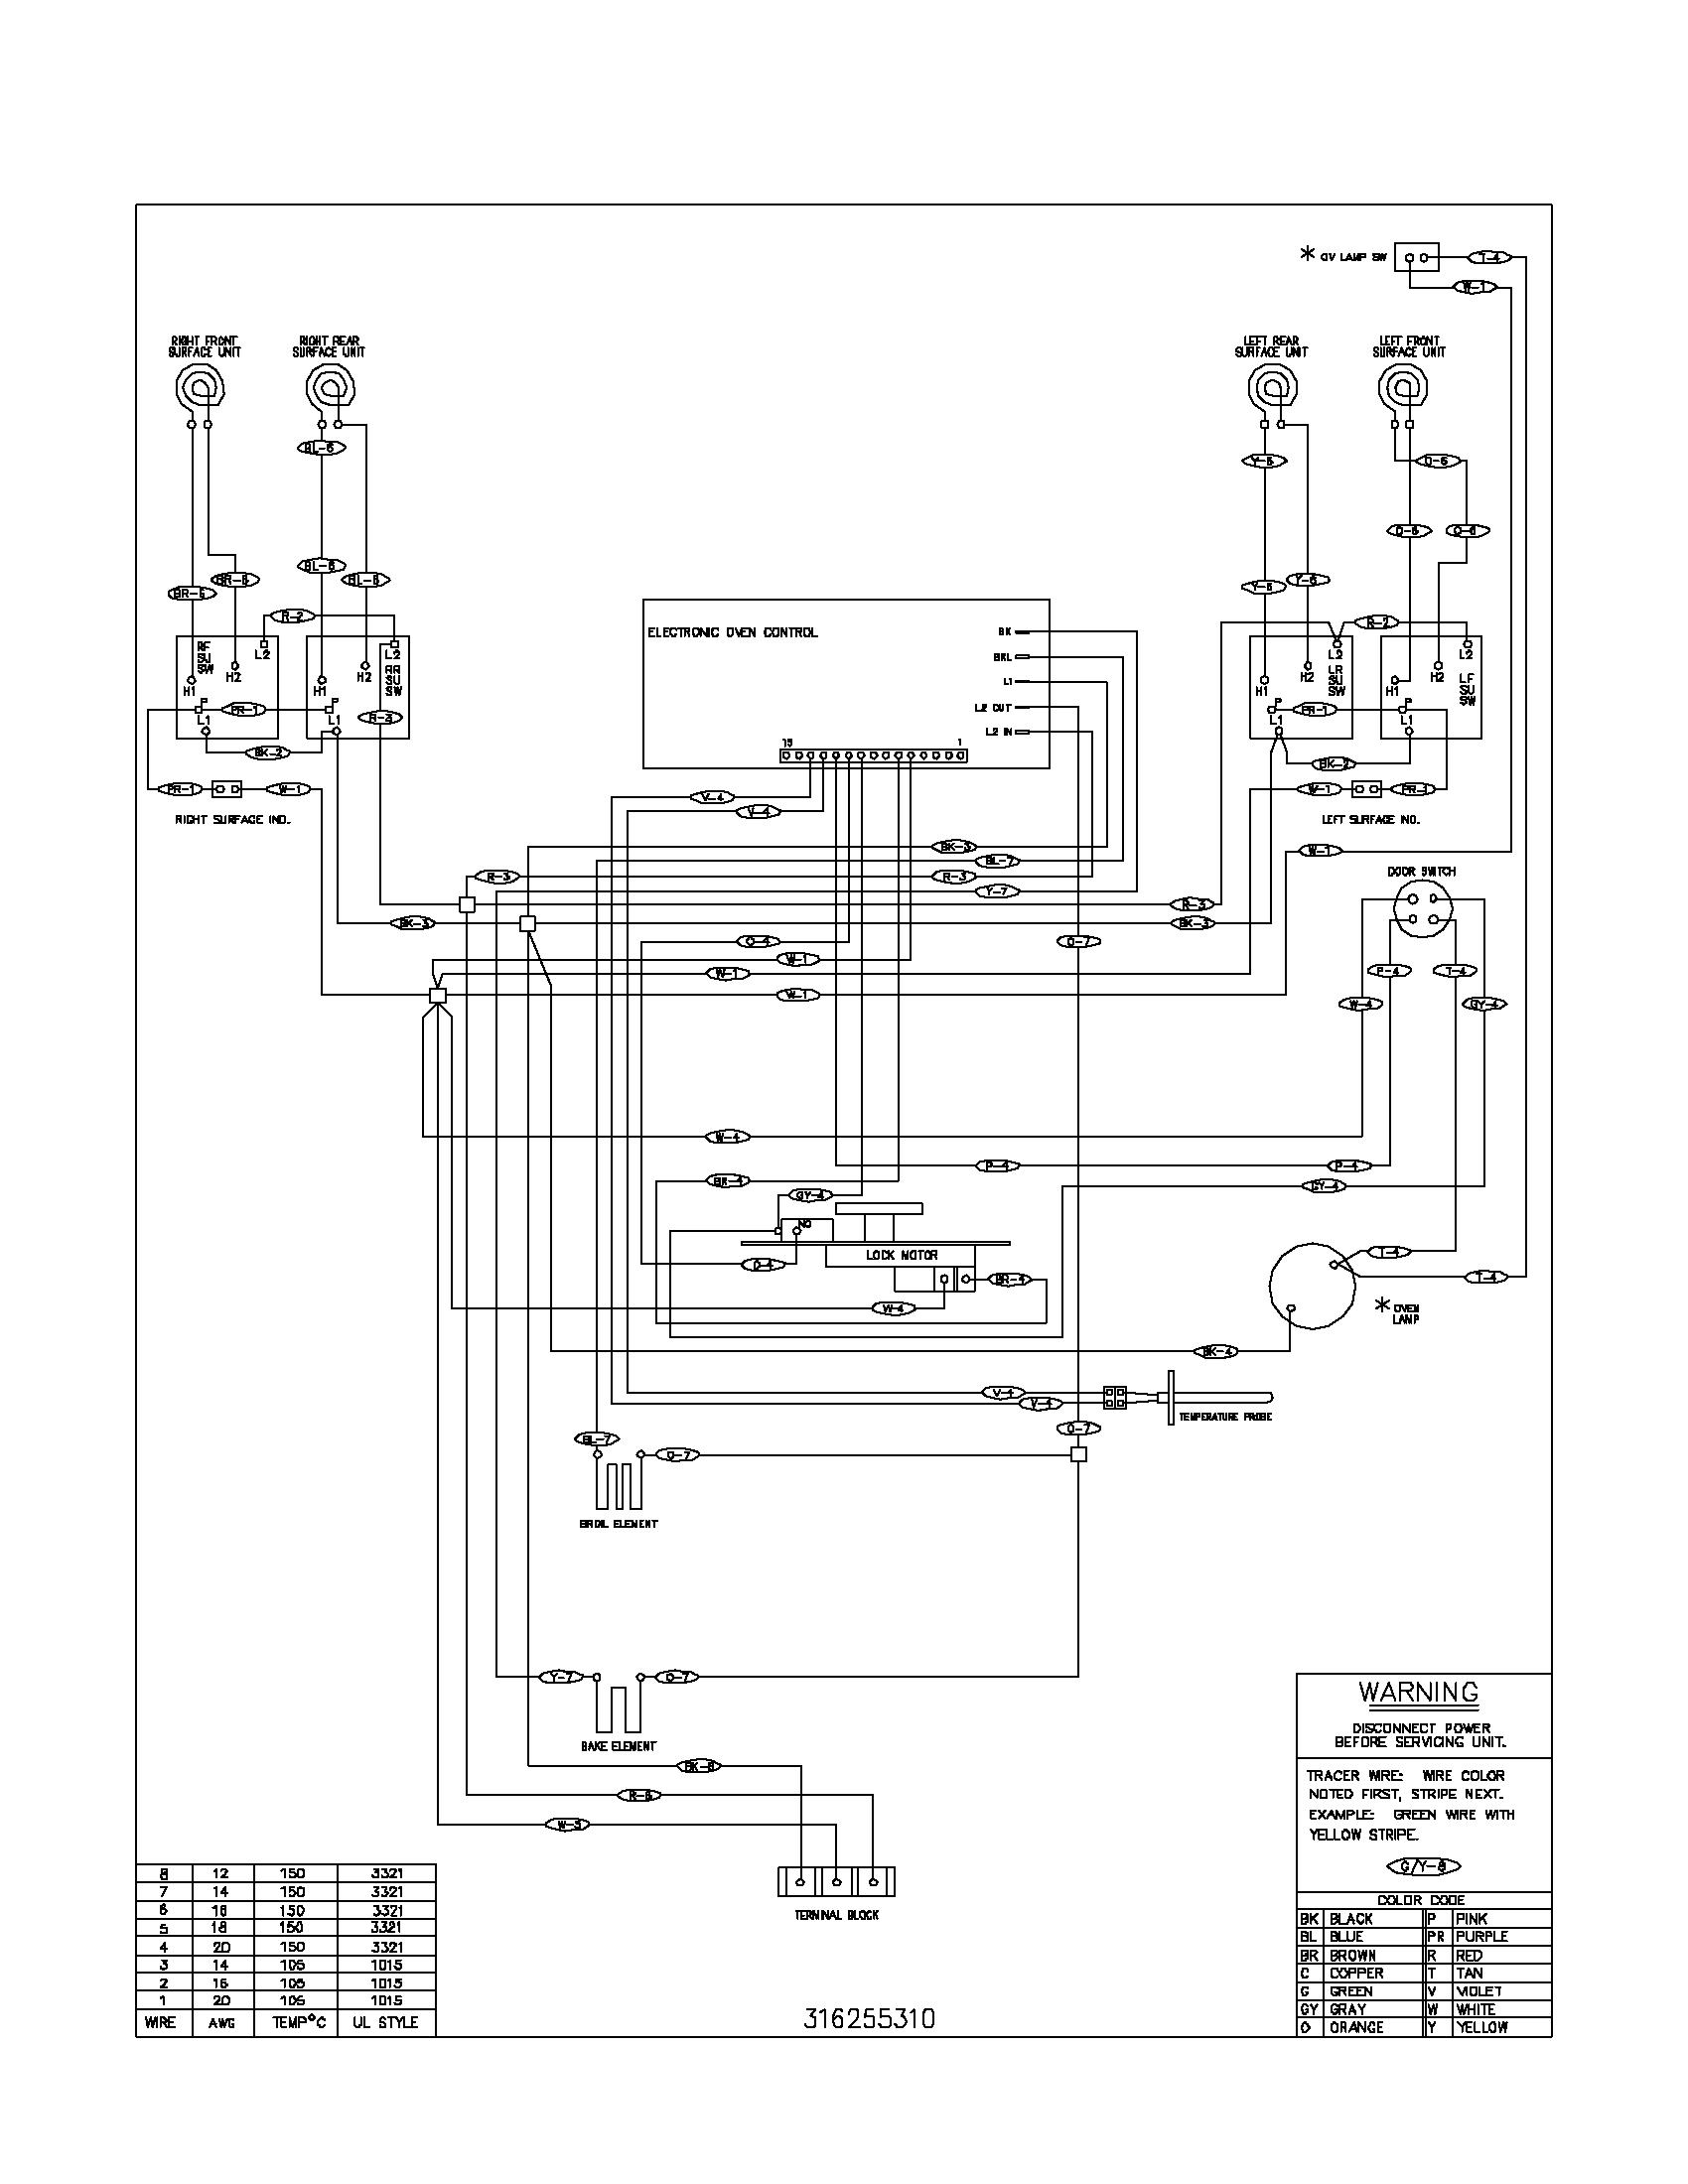 samsung ice maker wiring diagram [ 1700 x 2200 Pixel ]